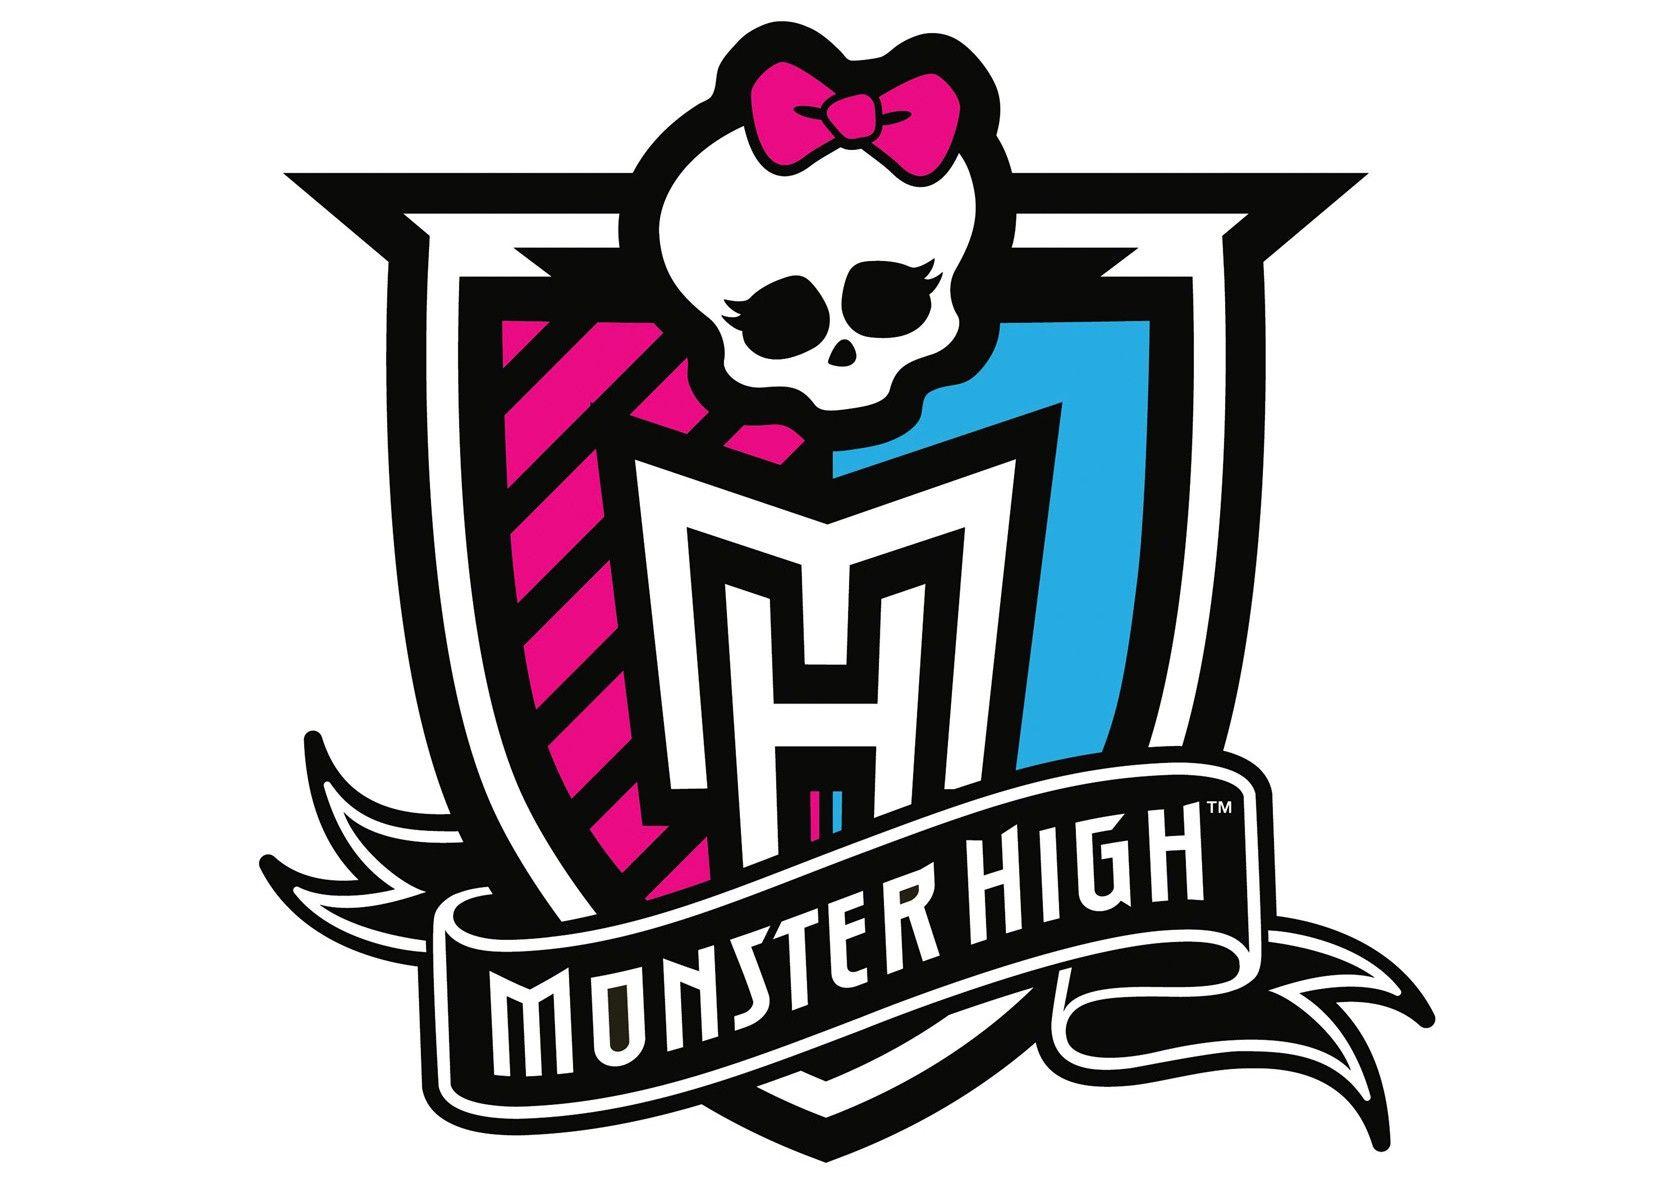 monster high logo image - Google Search | Alethia! :) | Pinterest ...